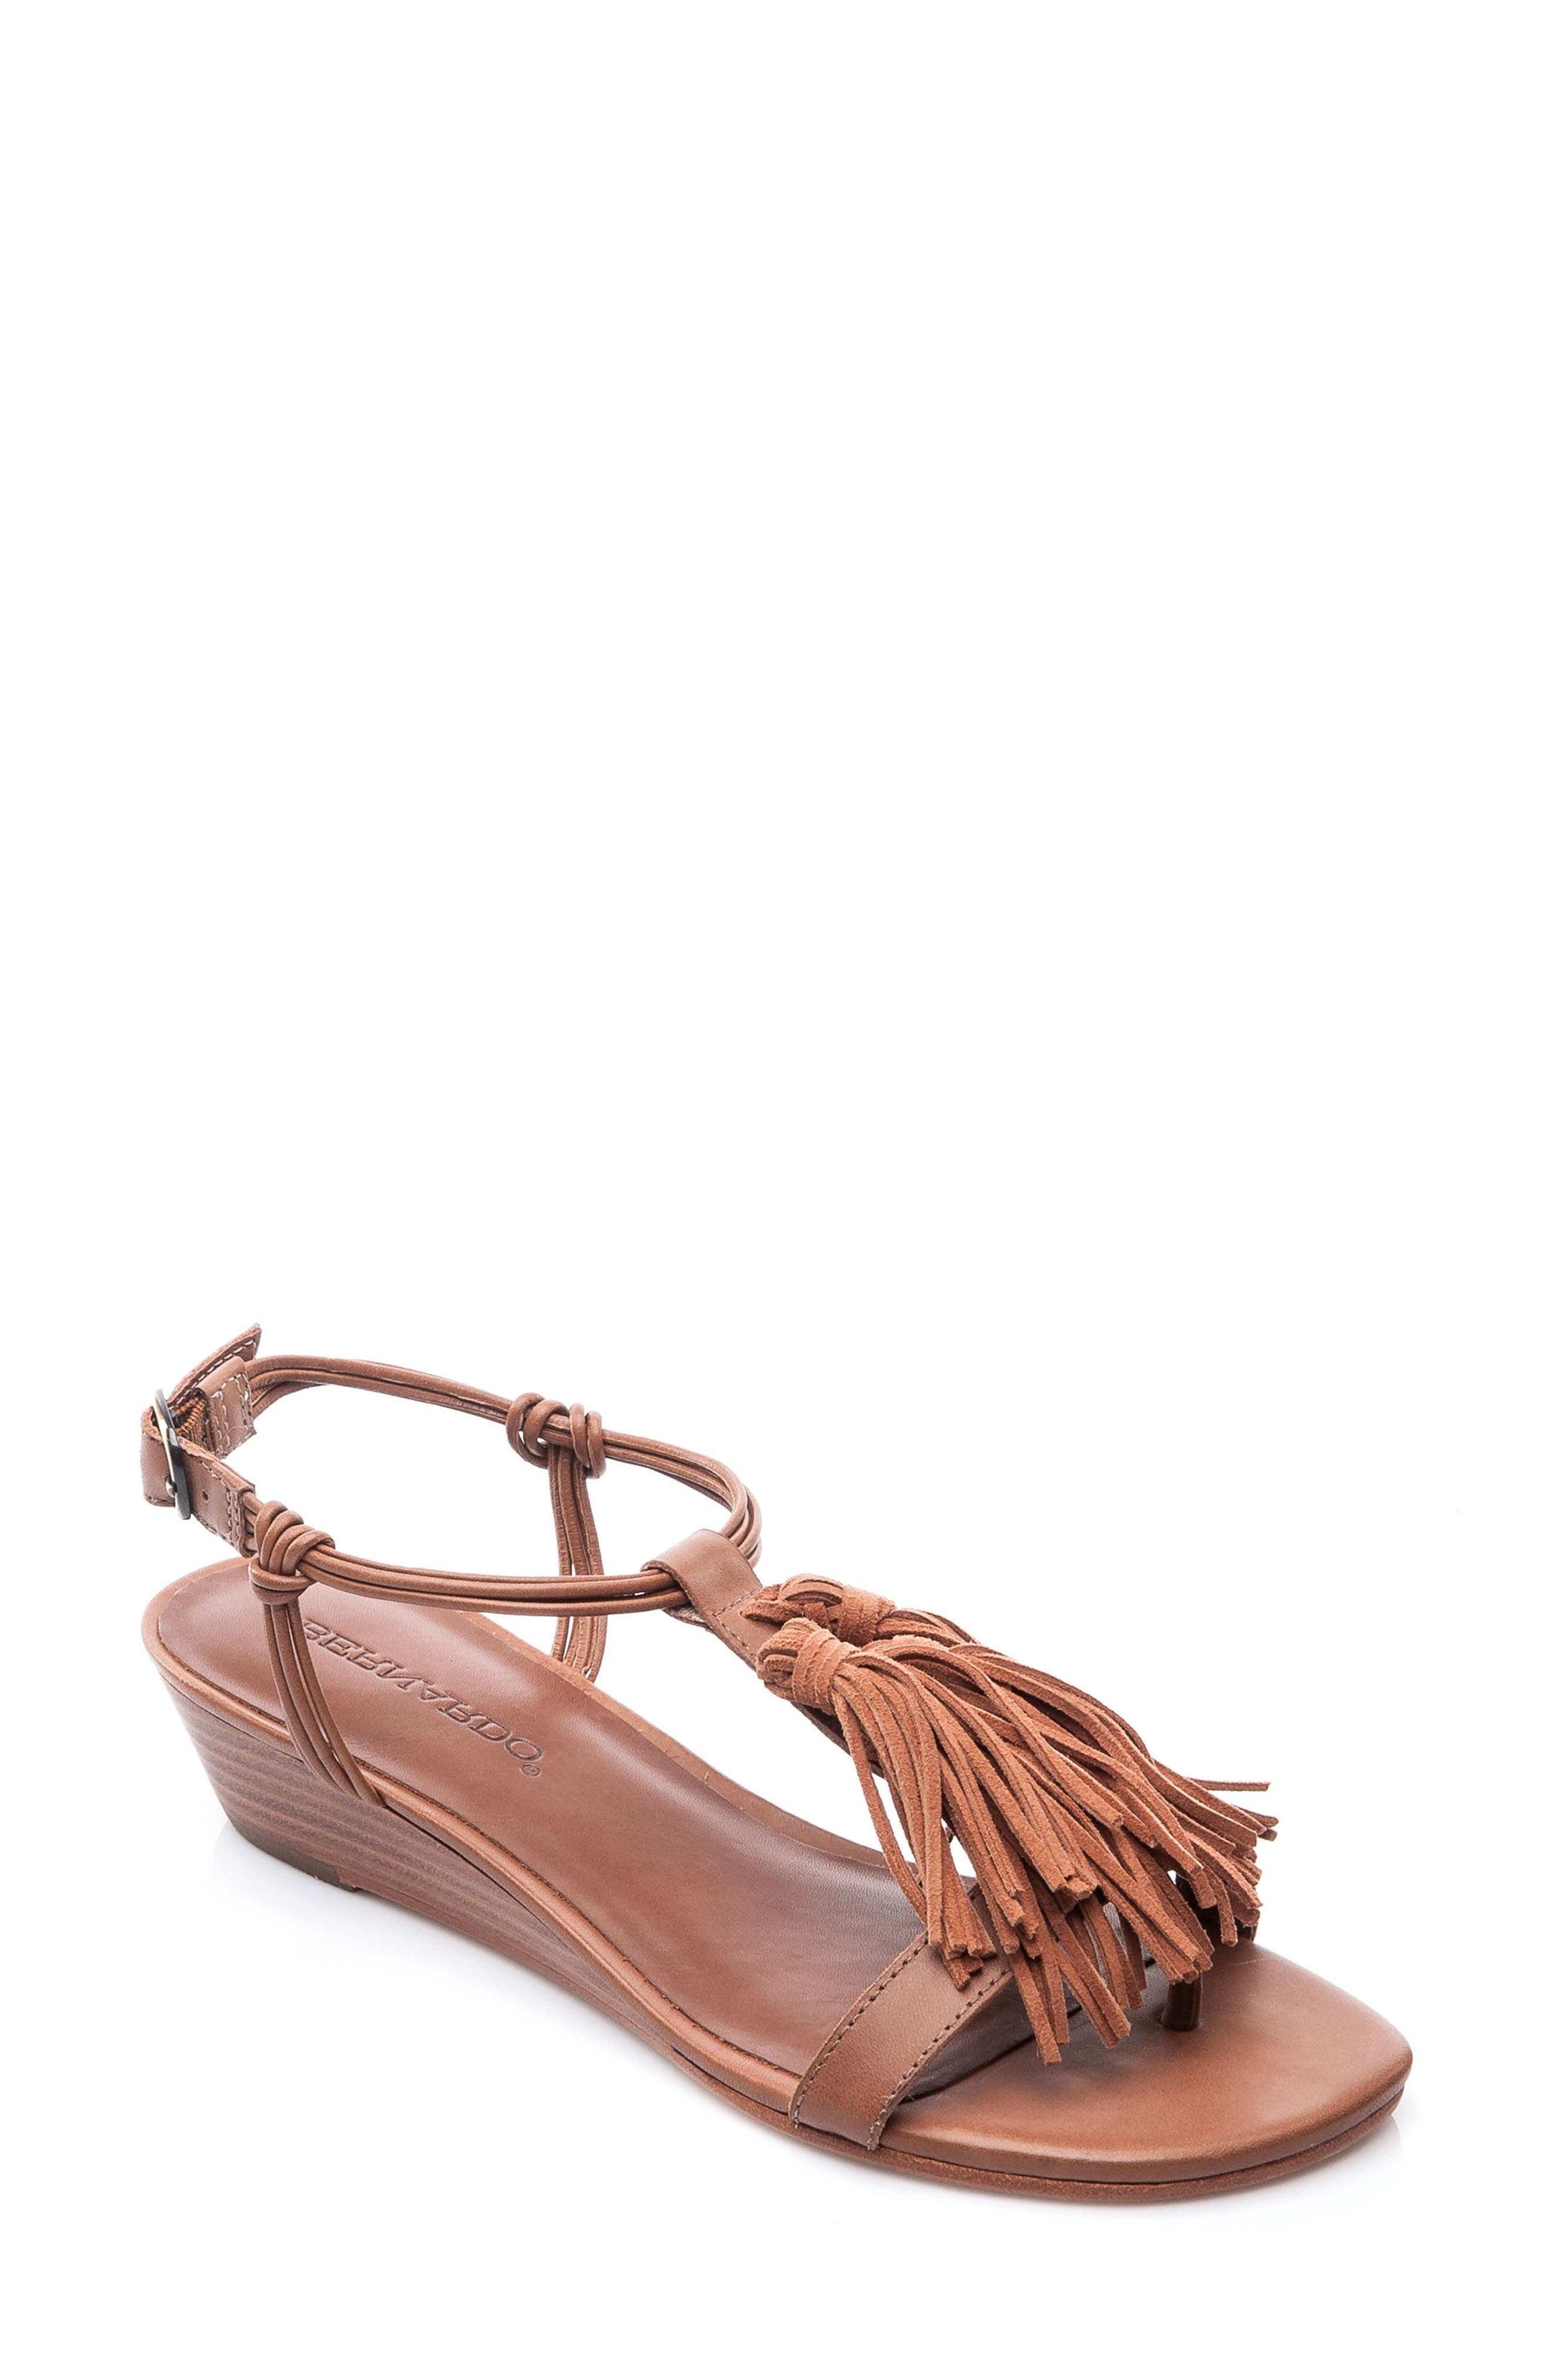 Footwear Court Fringe Leather Sandal,                         Main,                         color, Luggage Leather